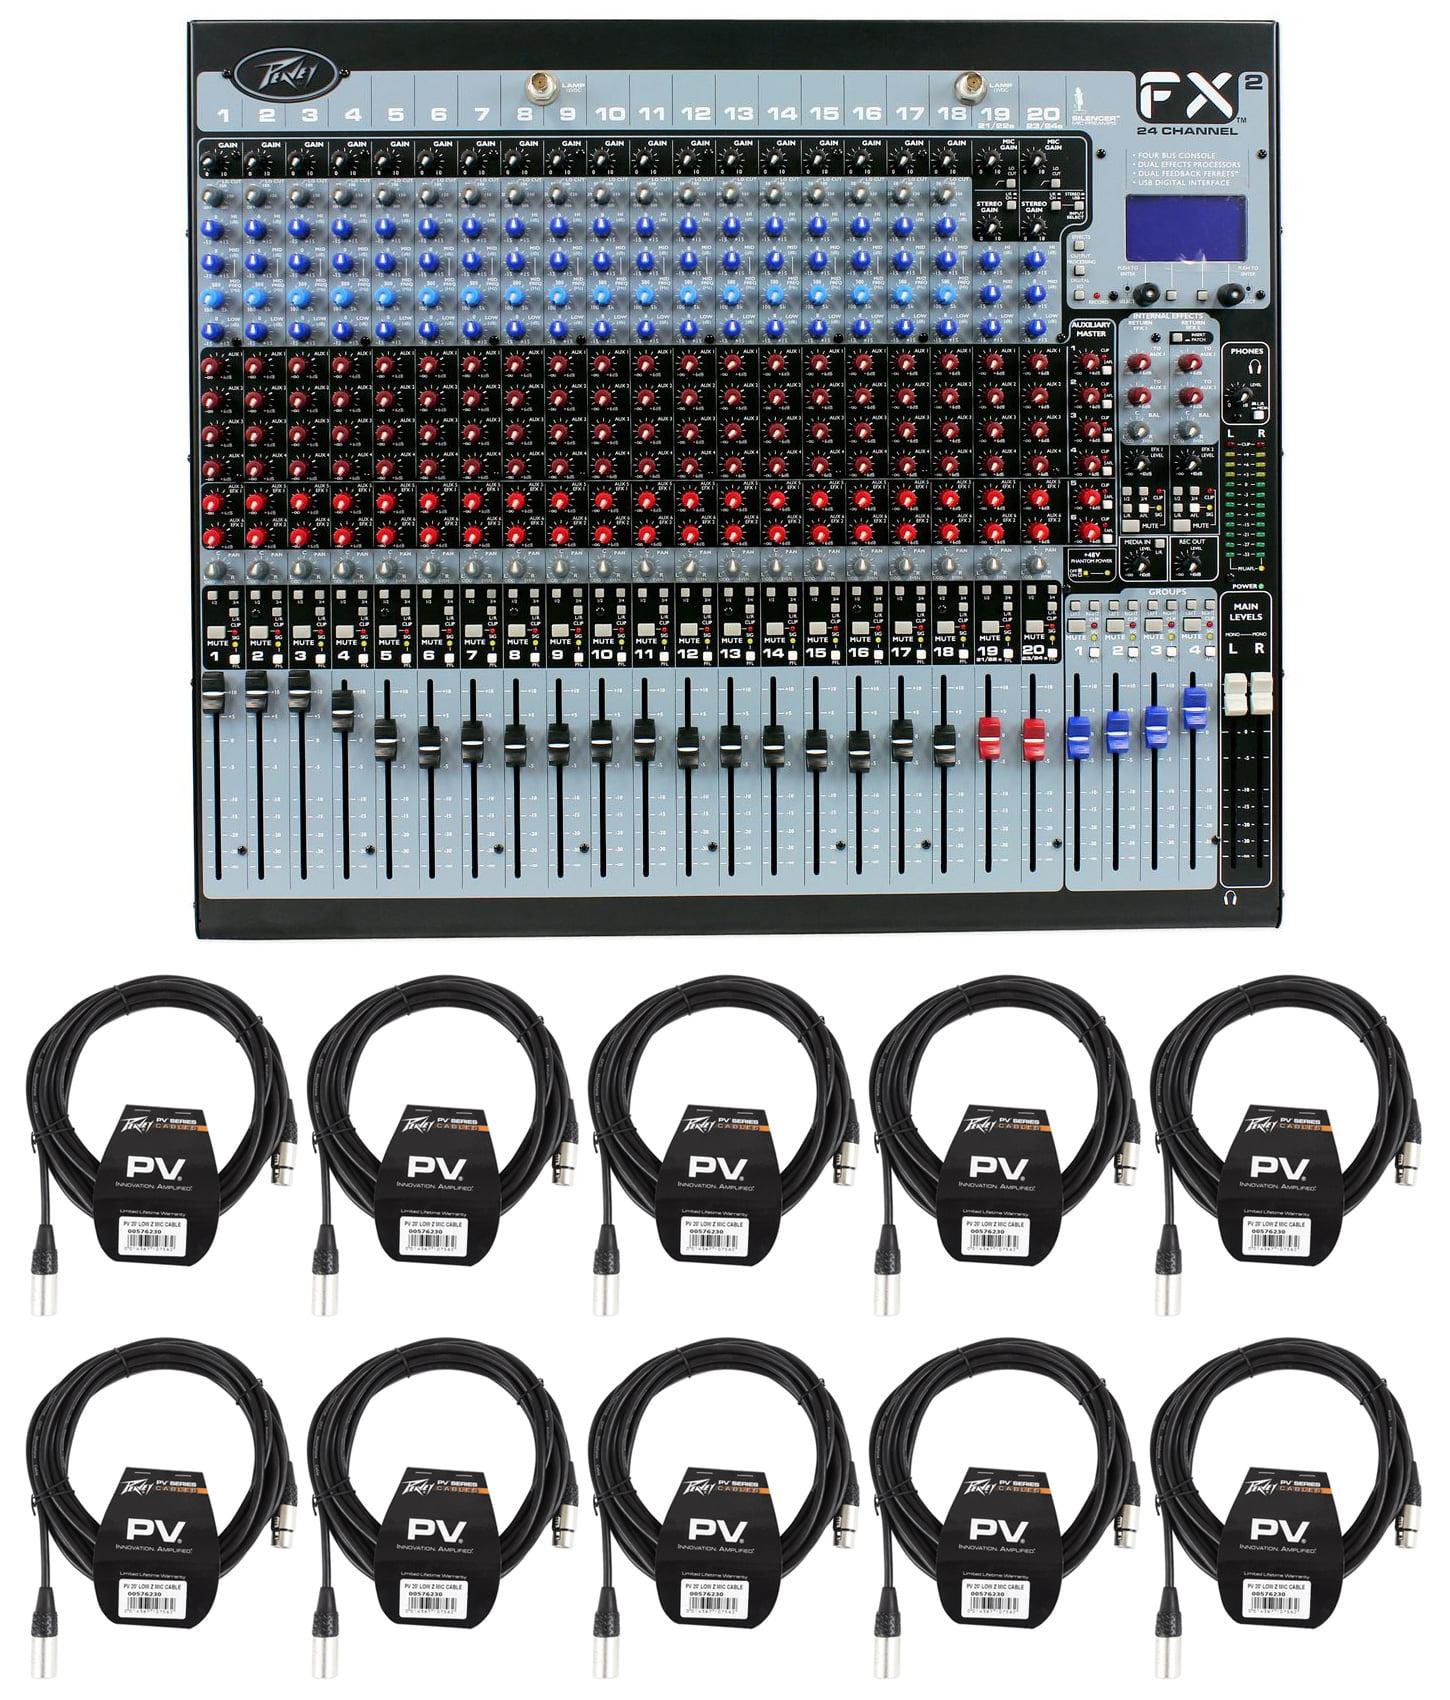 Peavey FX2 24 24x4x2 Mixer w  2 USB Ports + Dual DSP FX Engine + (10) XLR Cables by Peavey